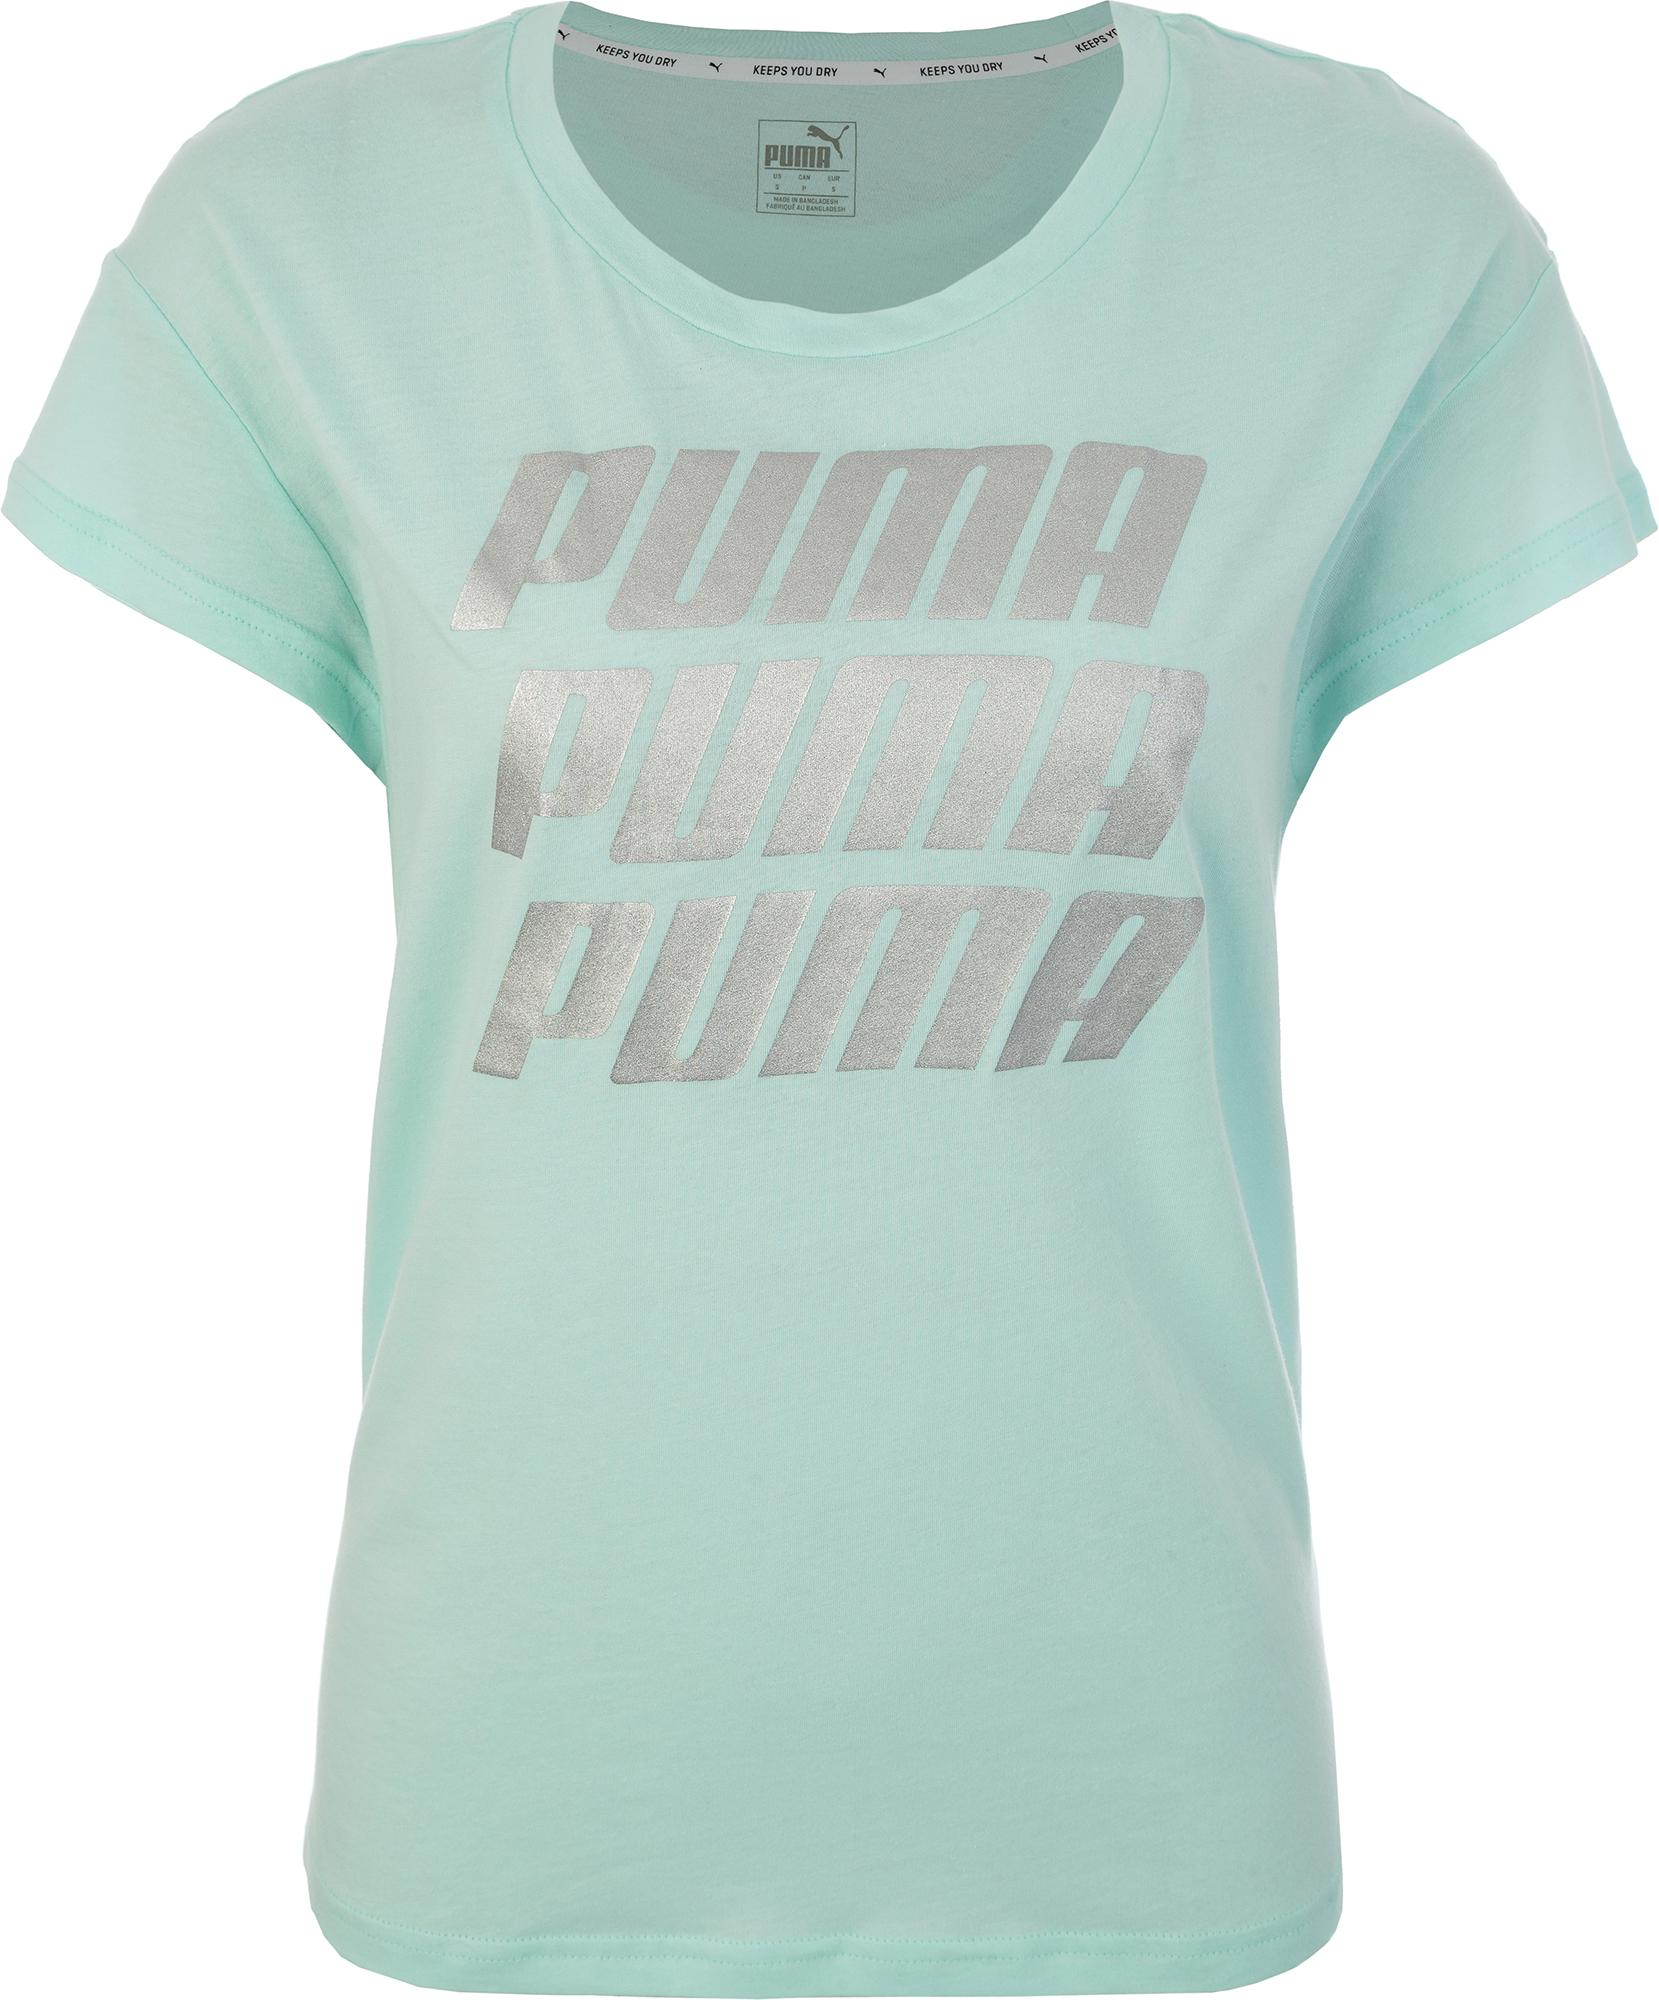 все цены на Puma Футболка женская Puma Modern, размер 46-48 онлайн